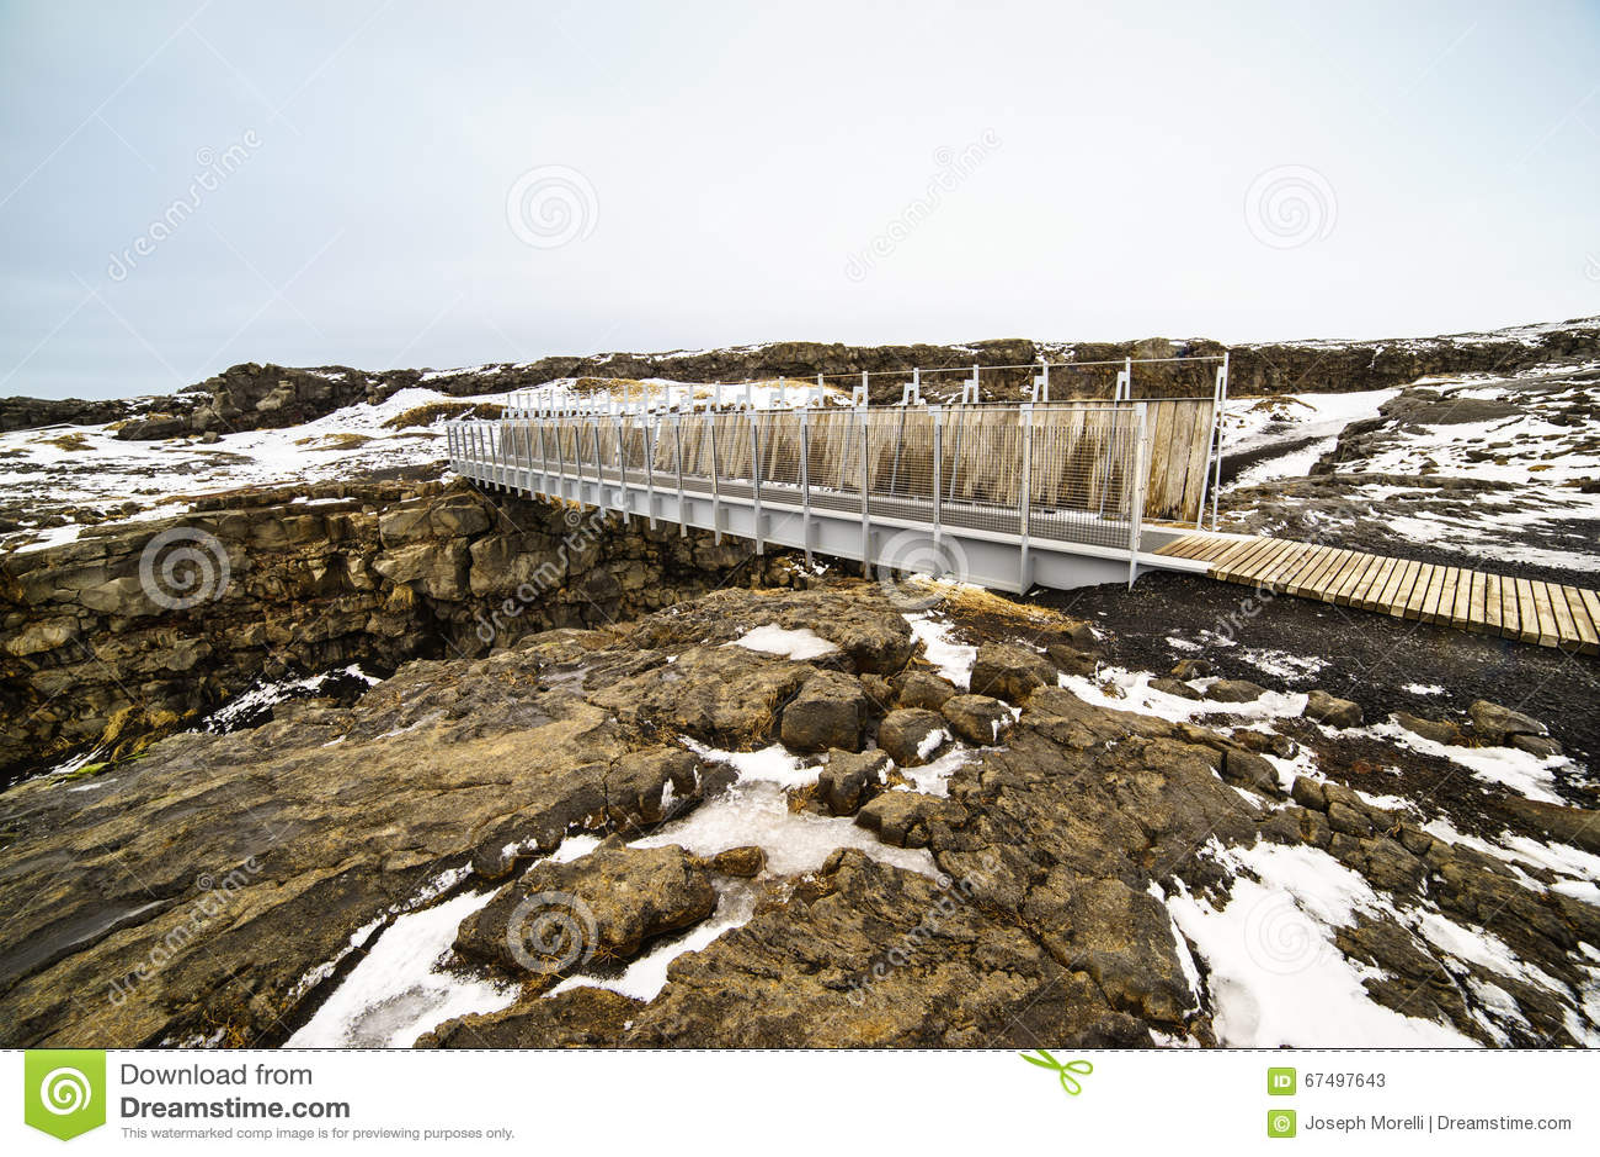 Bridge Between Continents Stock Photo - Image: 67497643